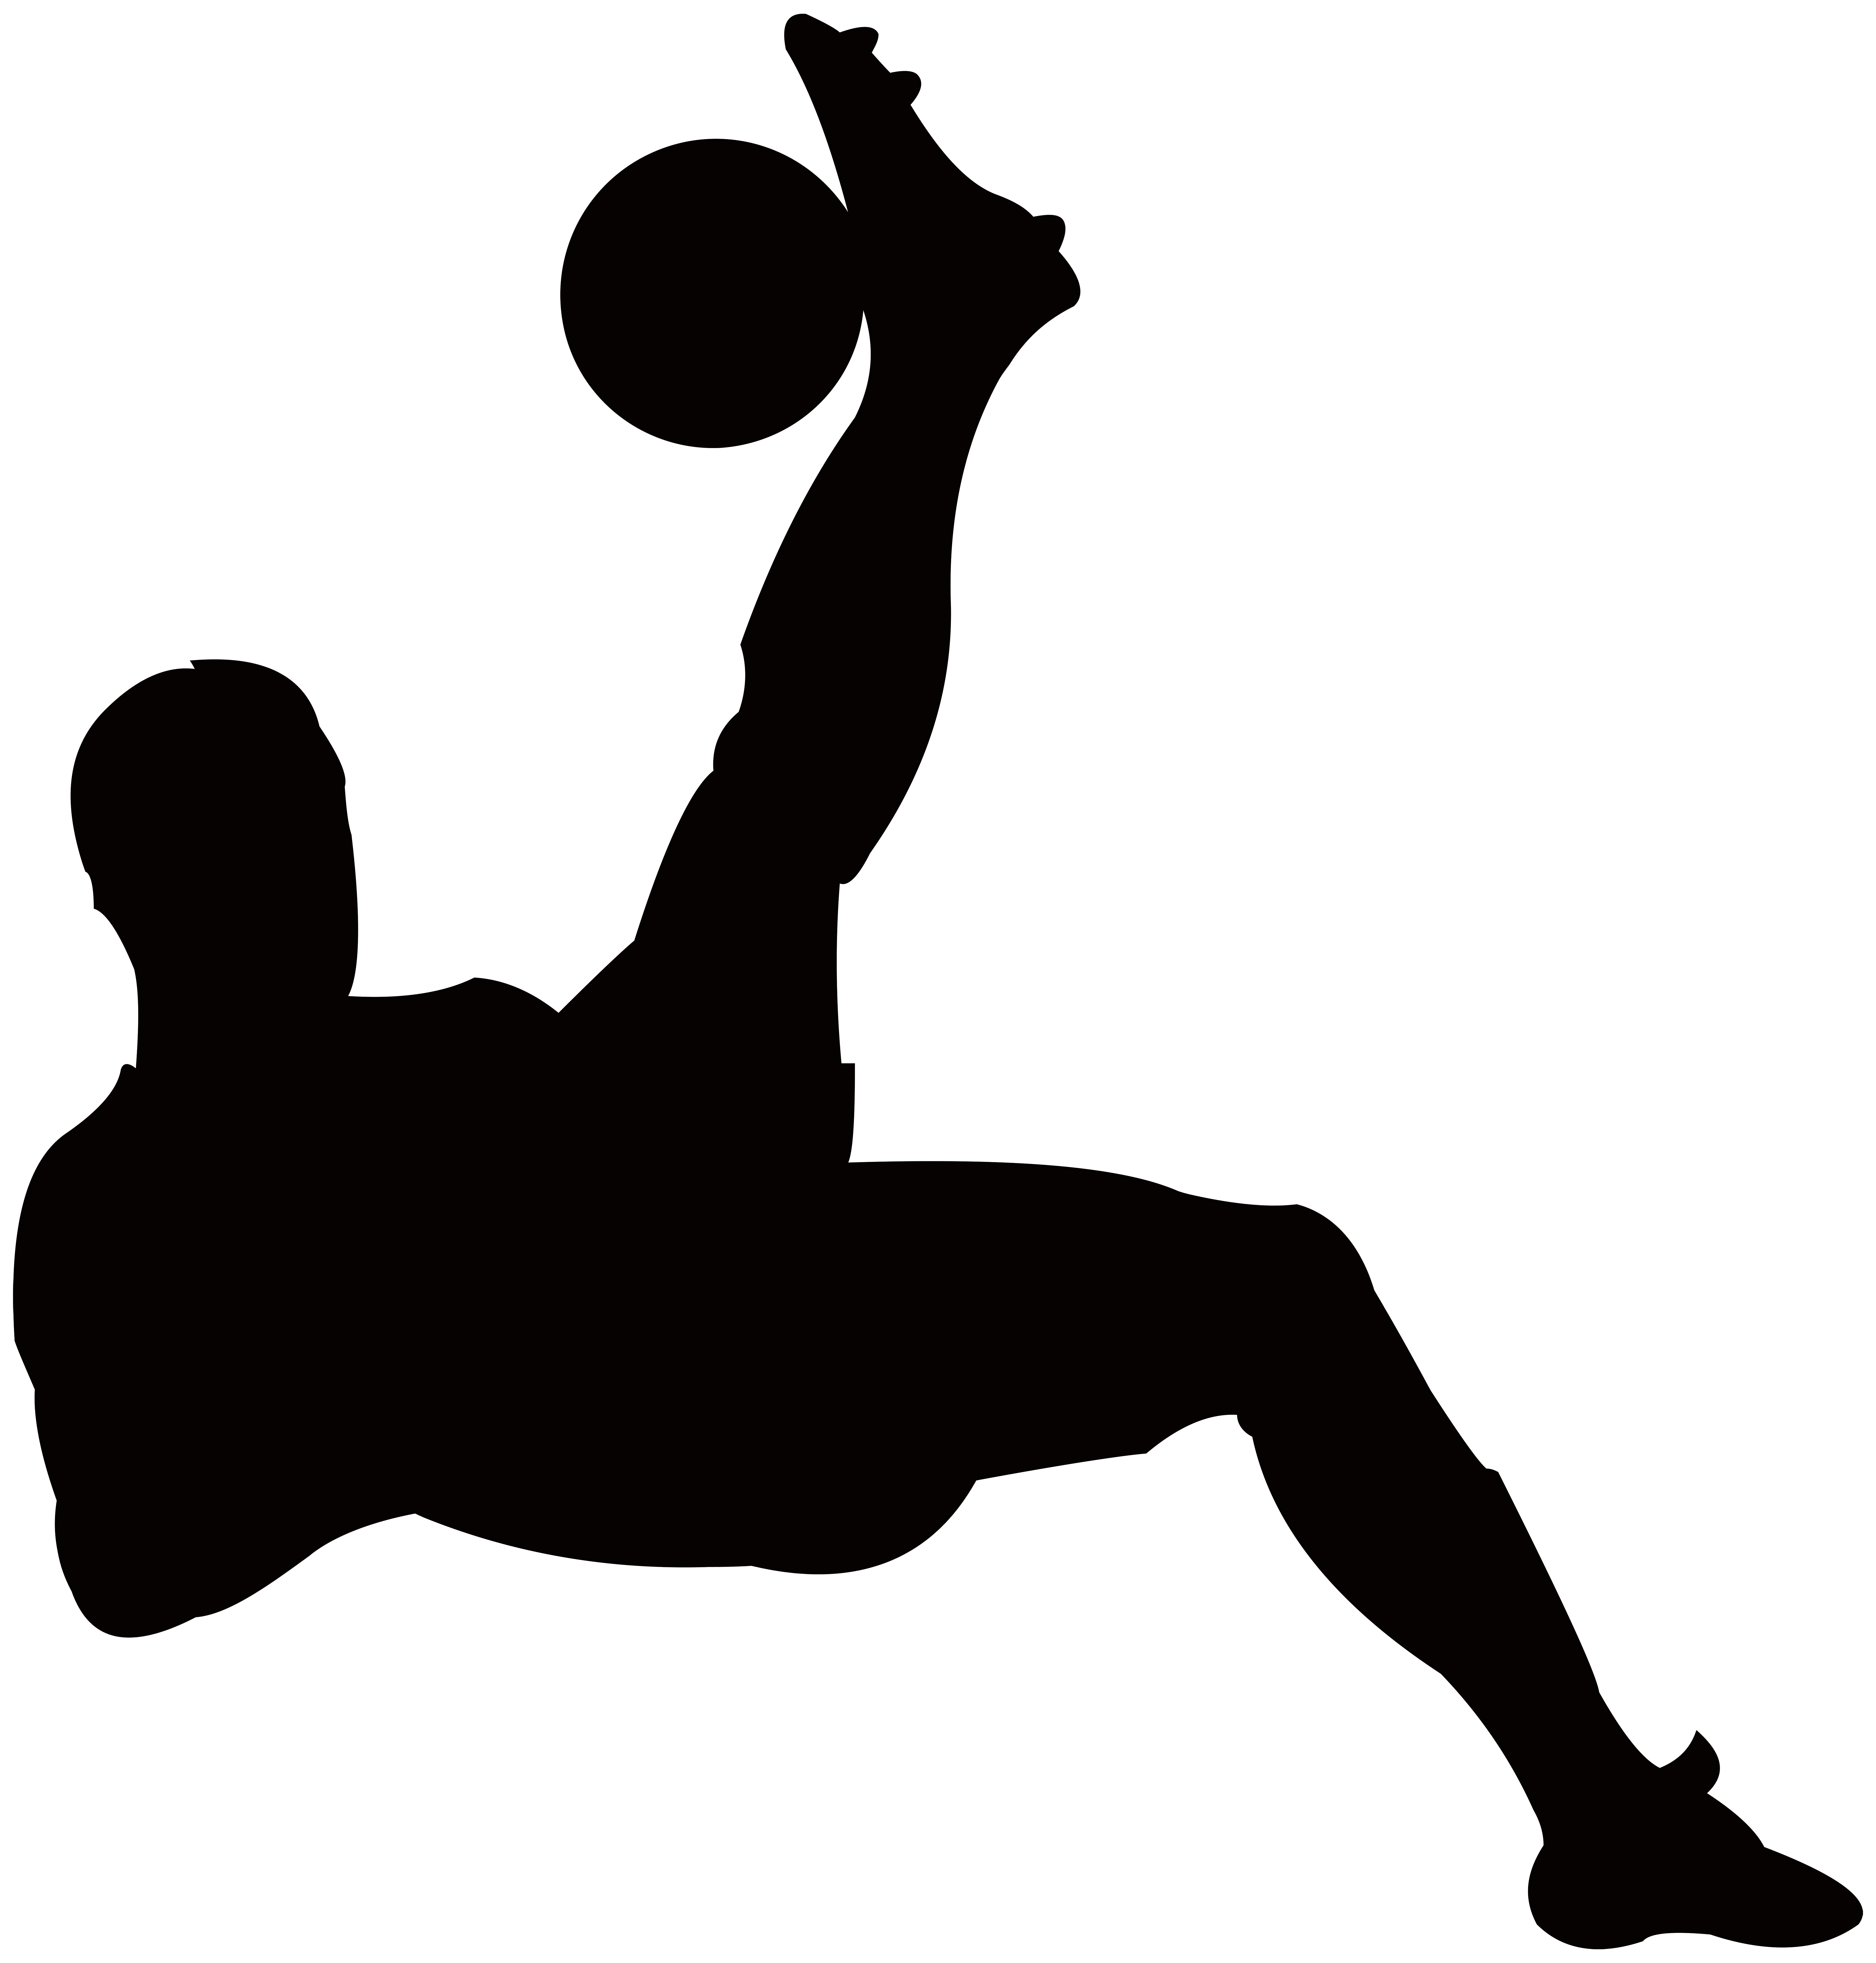 7645x8000 Player Silhouette Transparent Png Clip Art Image